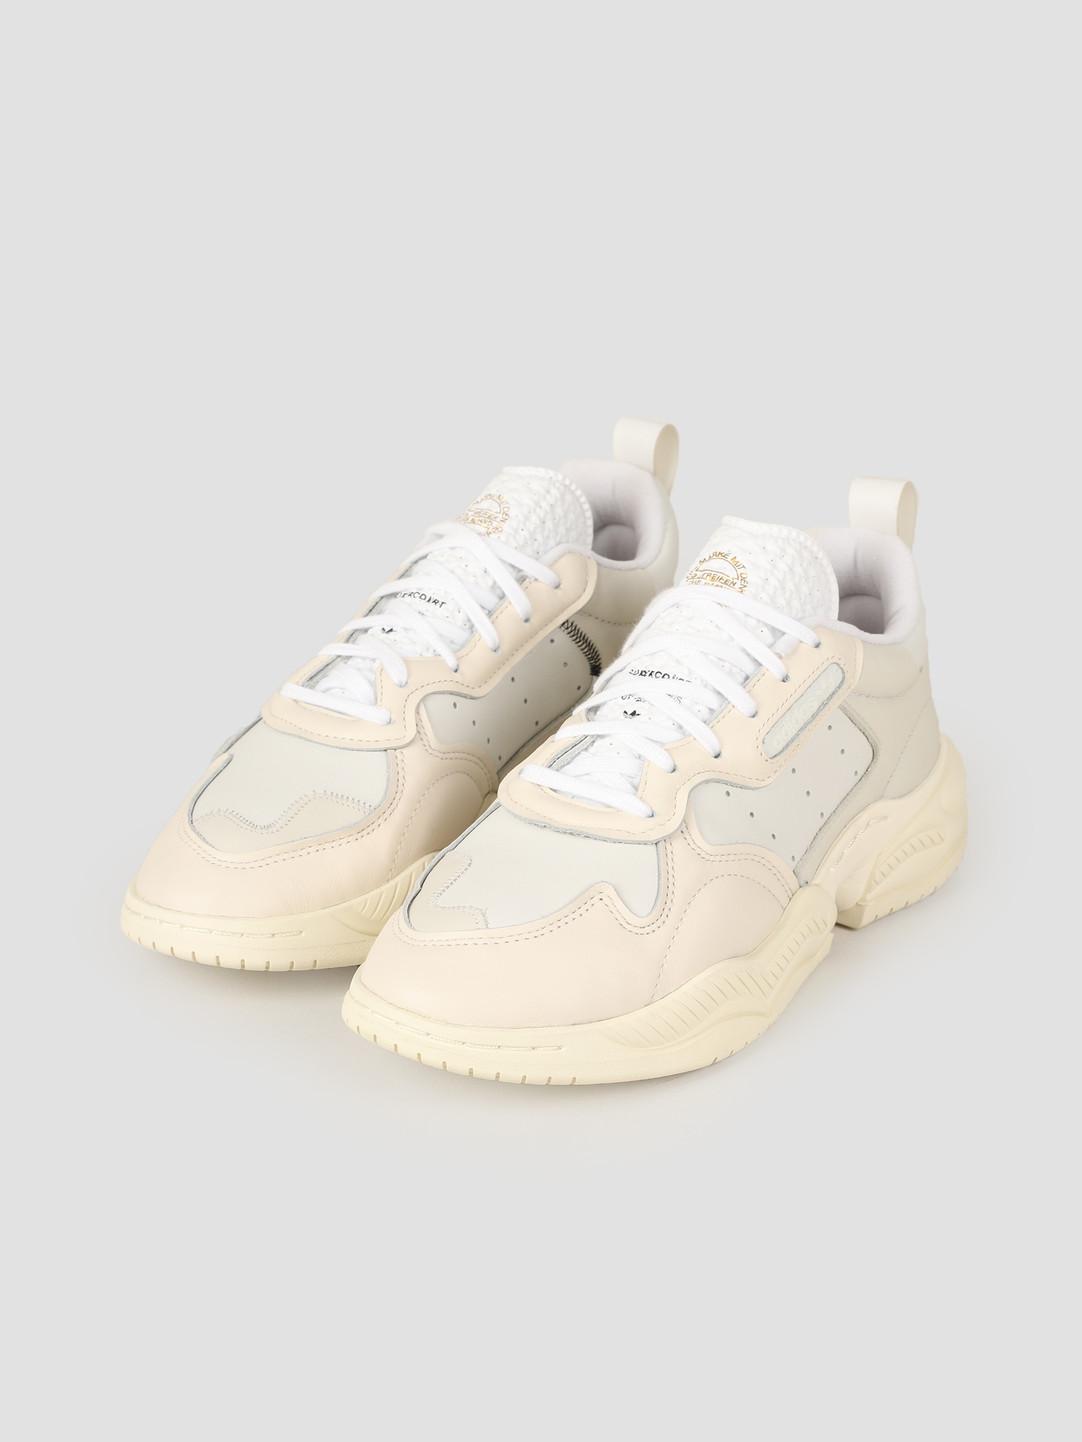 adidas adidas Supercourt Rx White EE6328